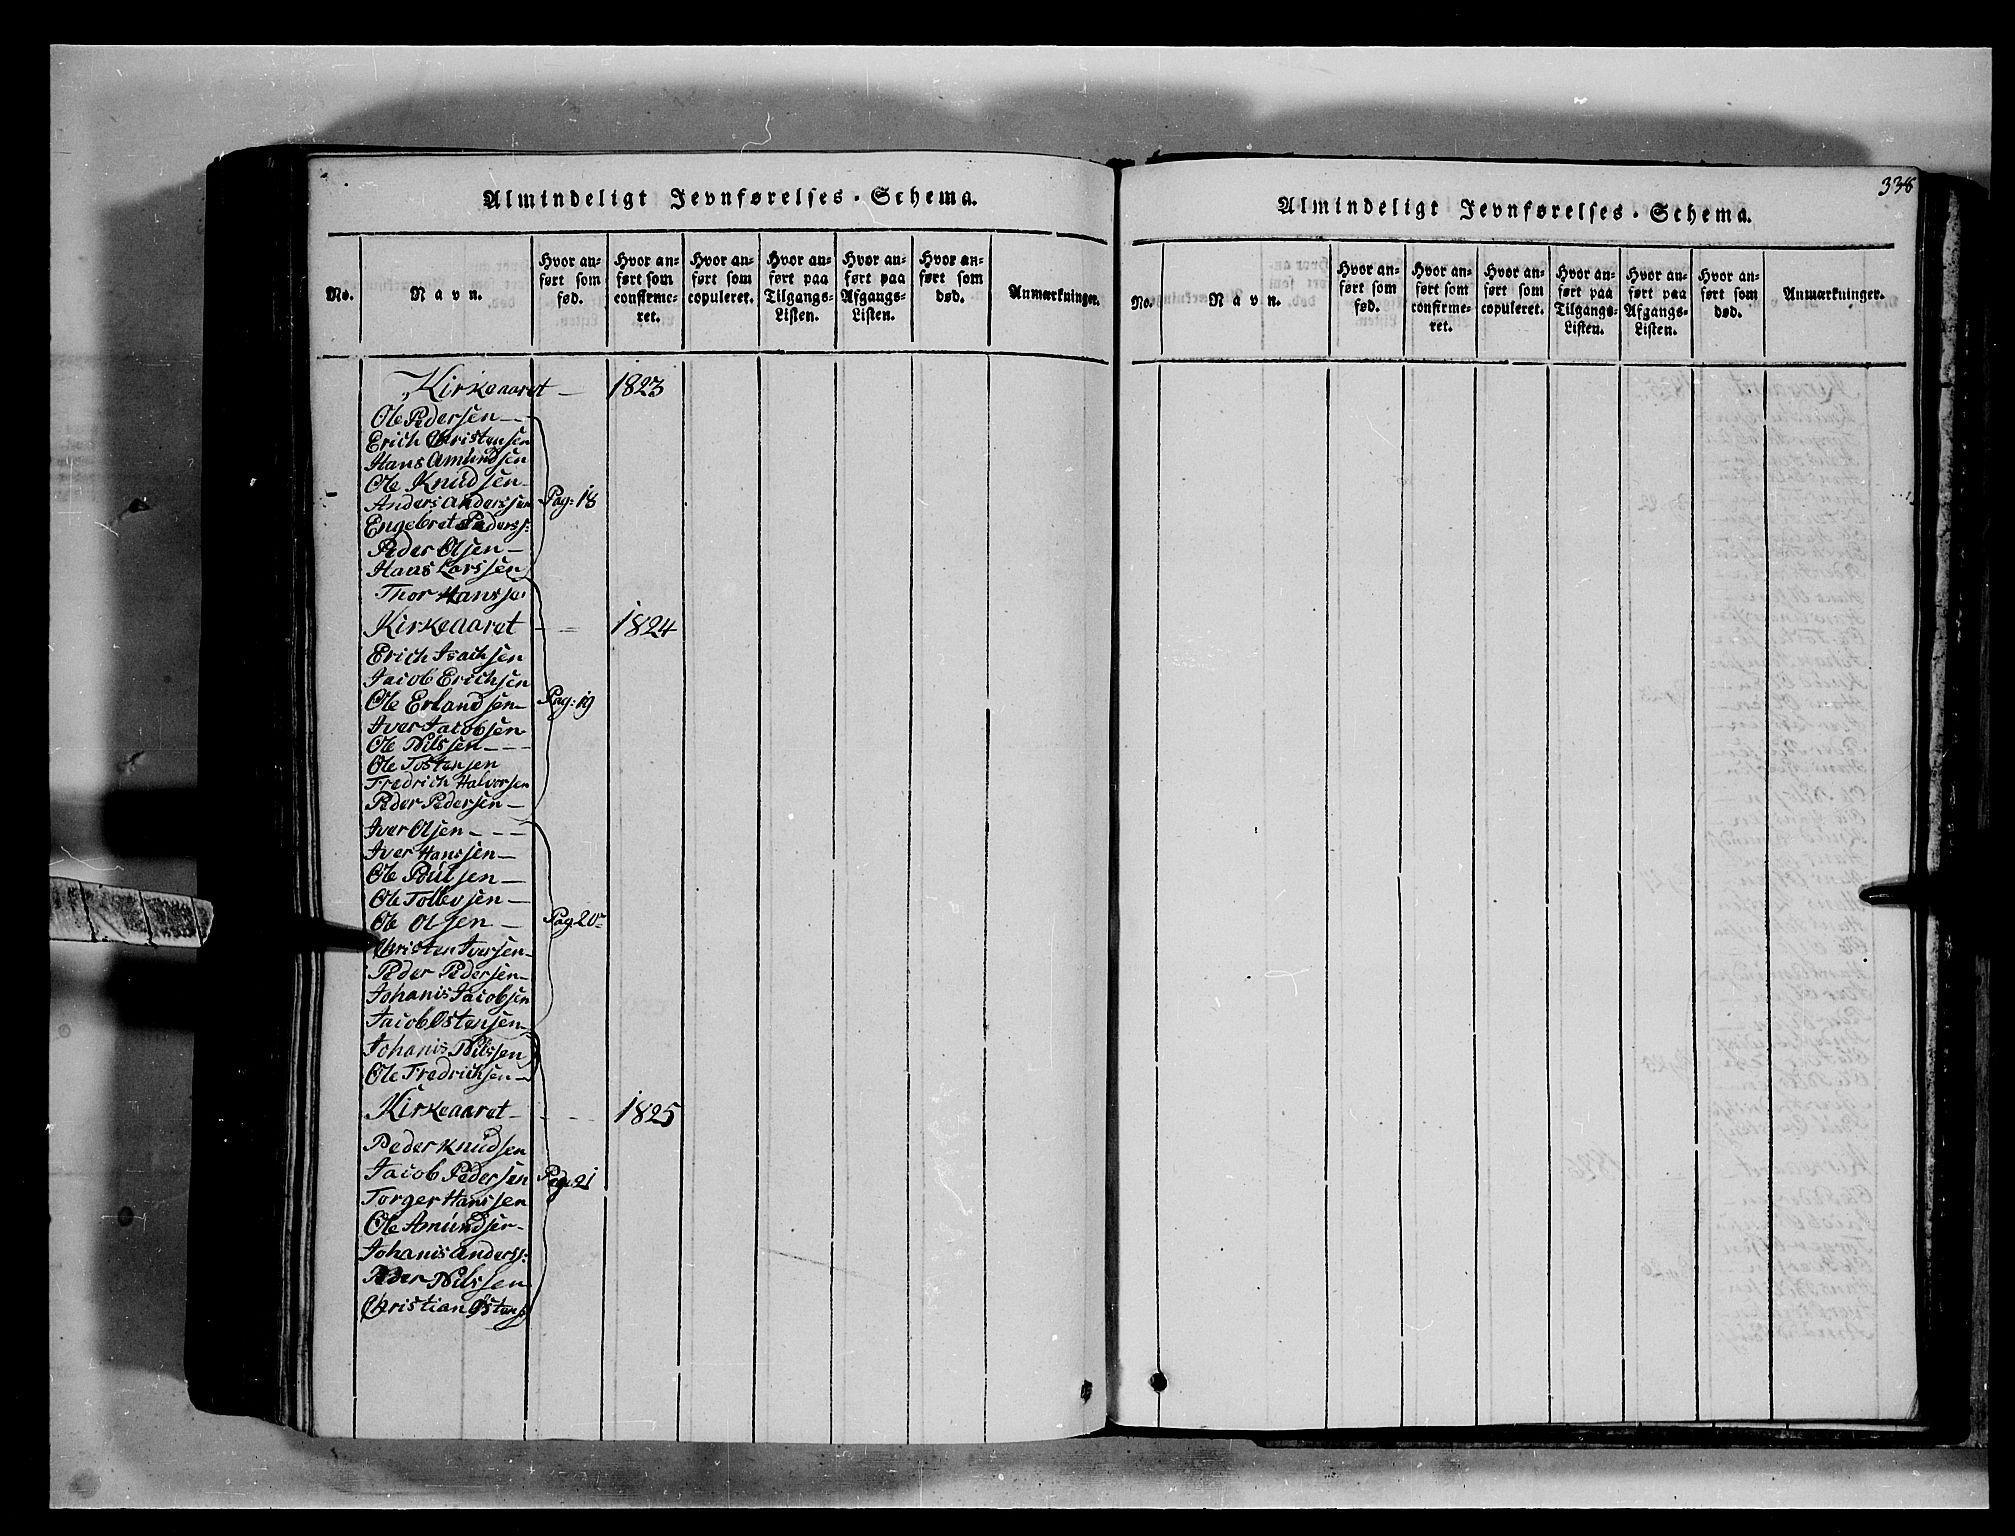 SAH, Fron prestekontor, H/Ha/Hab/L0002: Klokkerbok nr. 2, 1816-1850, s. 338